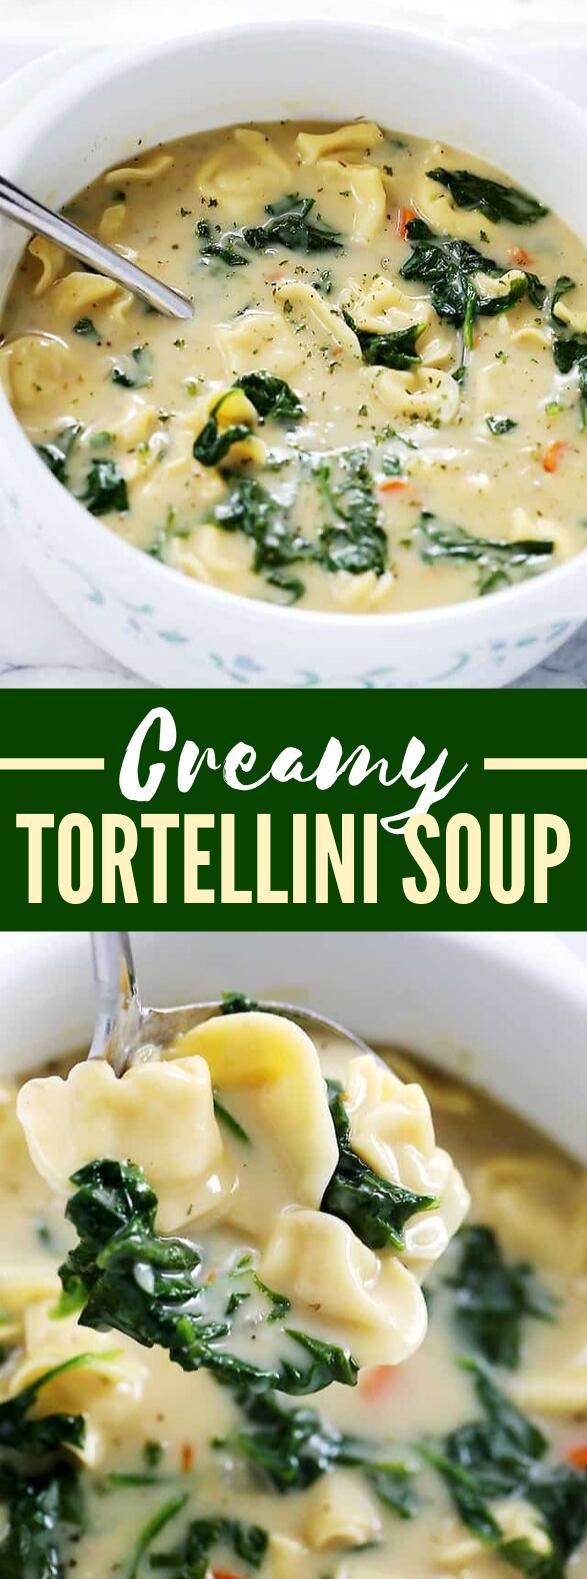 Creamy Tortellini Soup #vegetarian #spinach